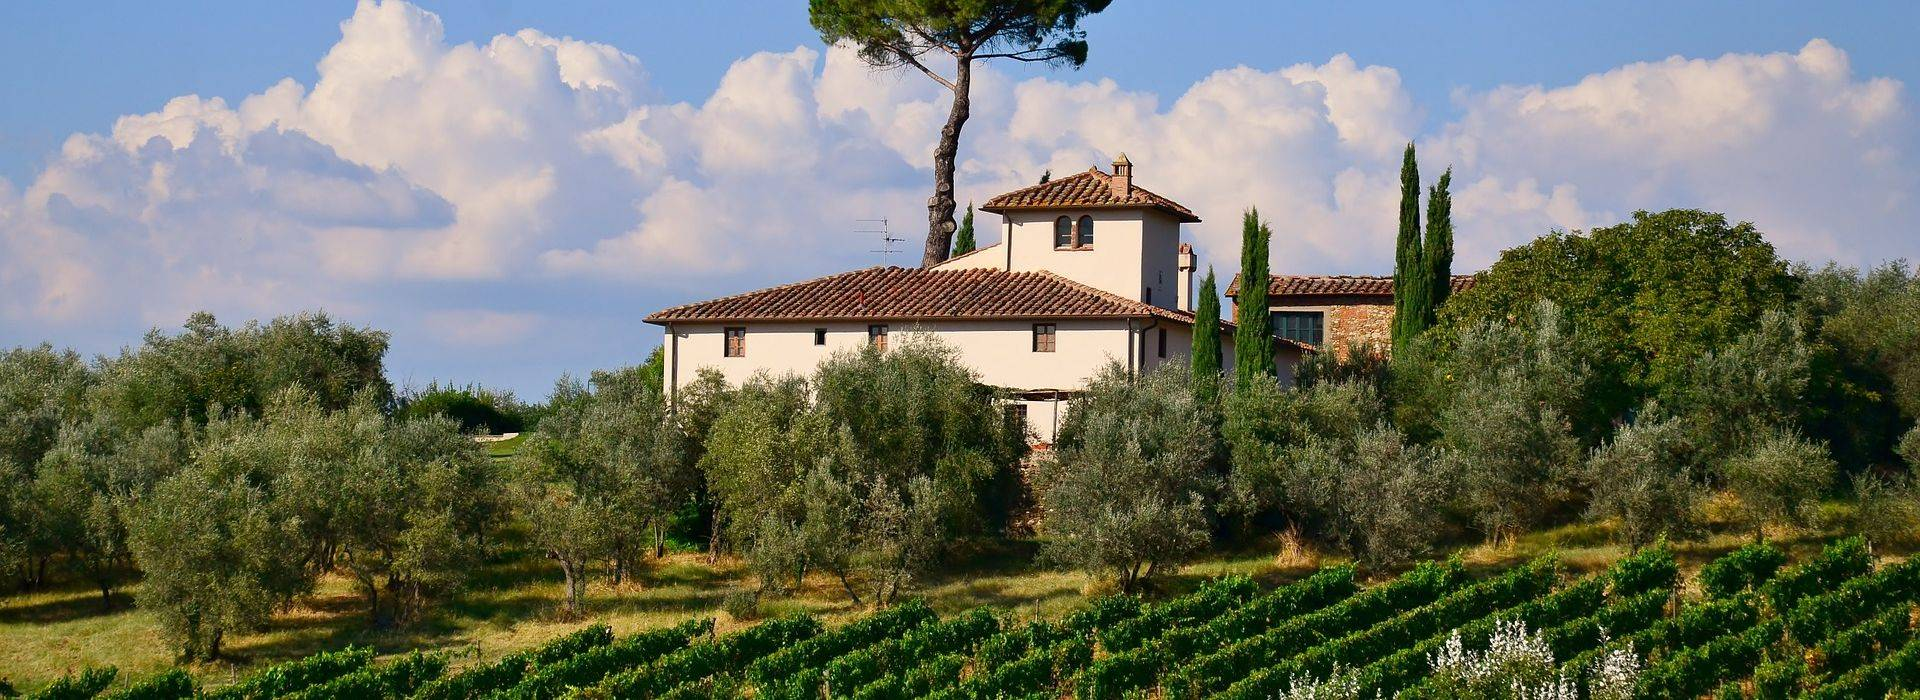 Italy Wellness Vacations